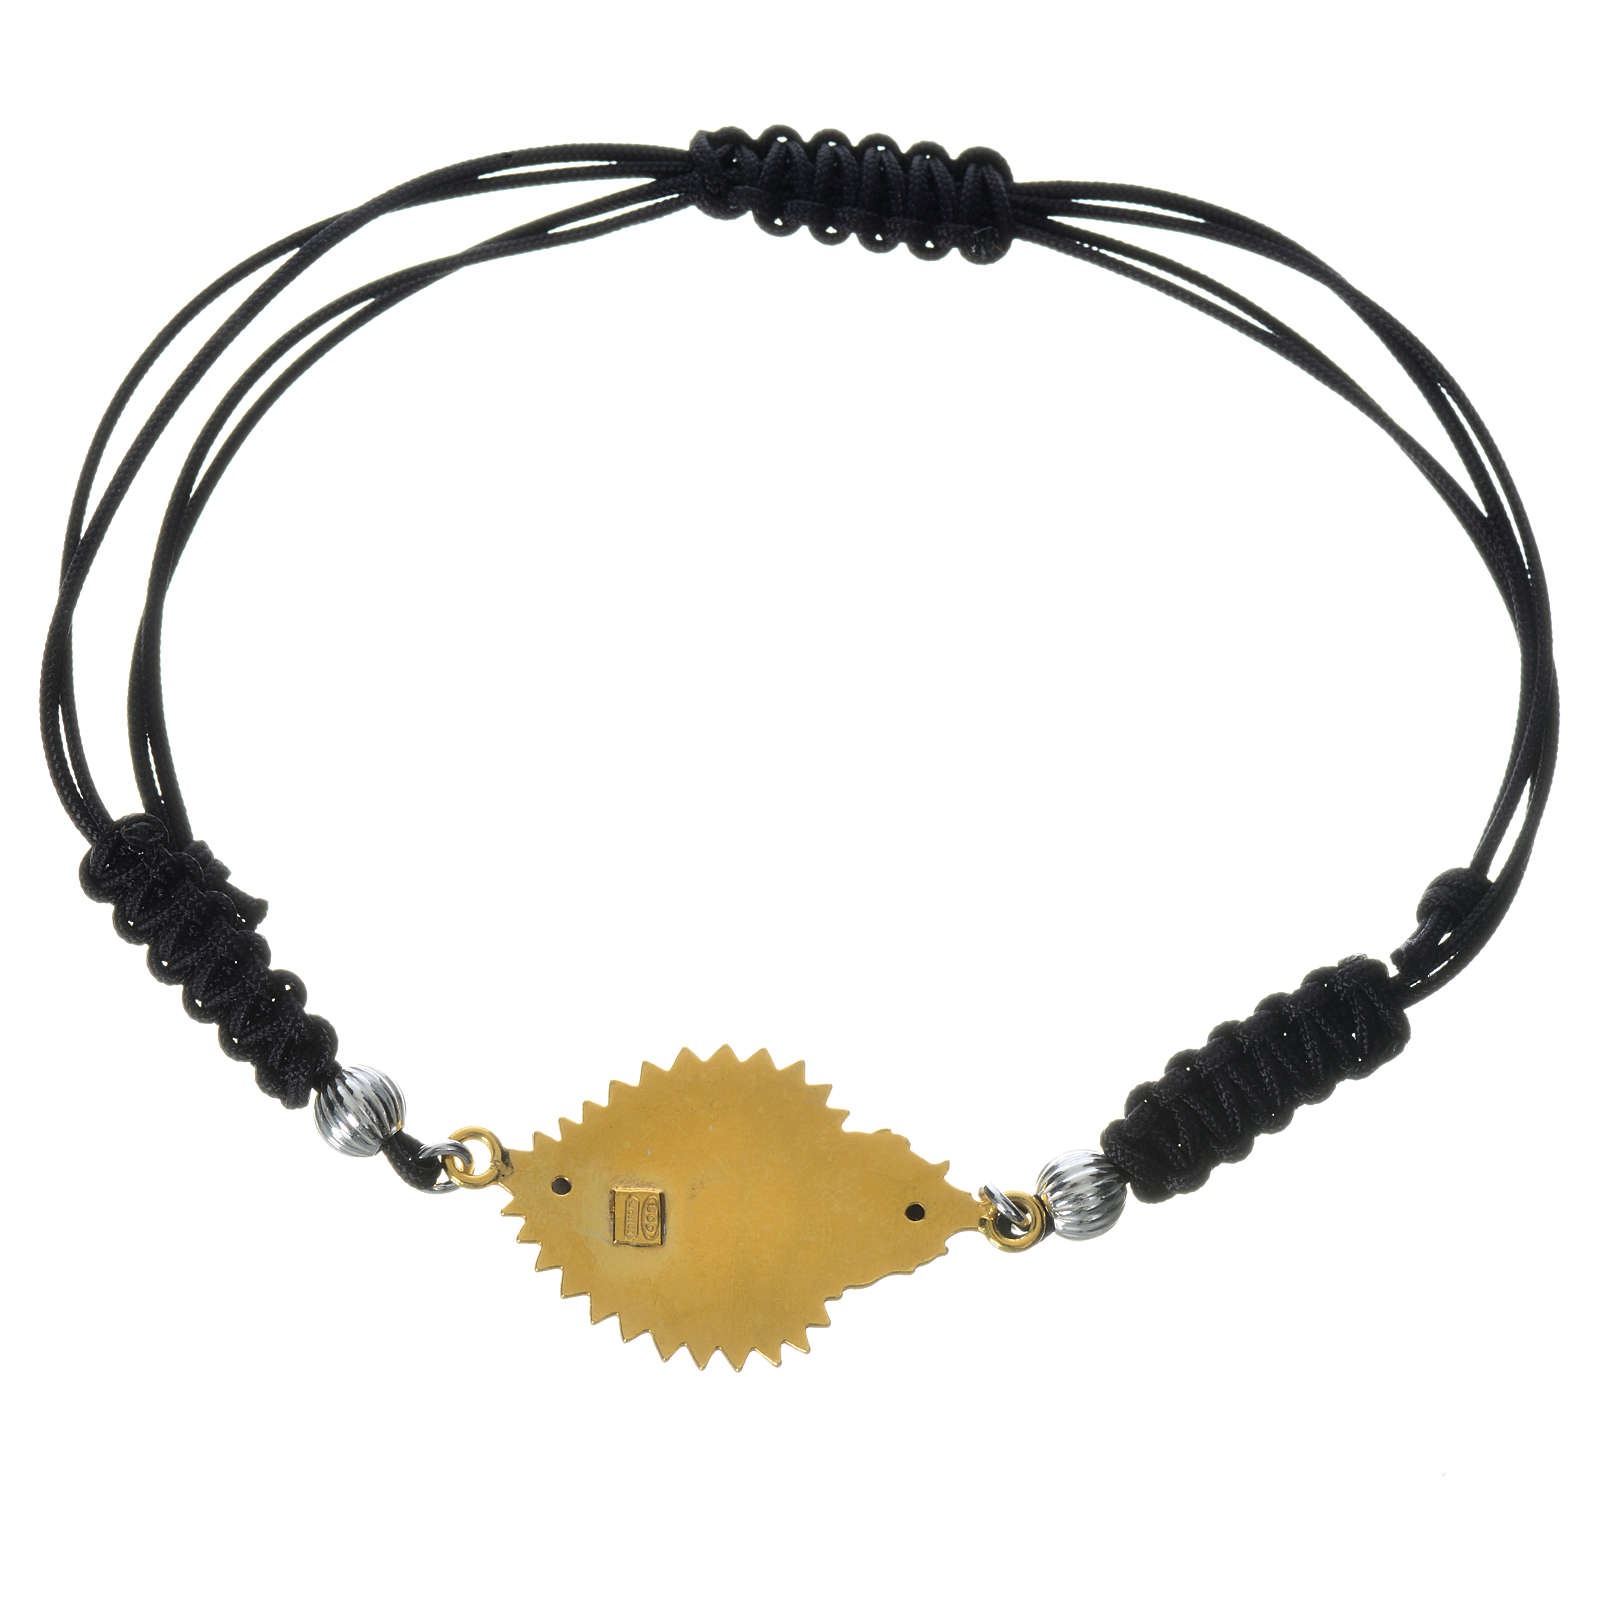 Bracelet with Exvoto heart in 925 silver 4